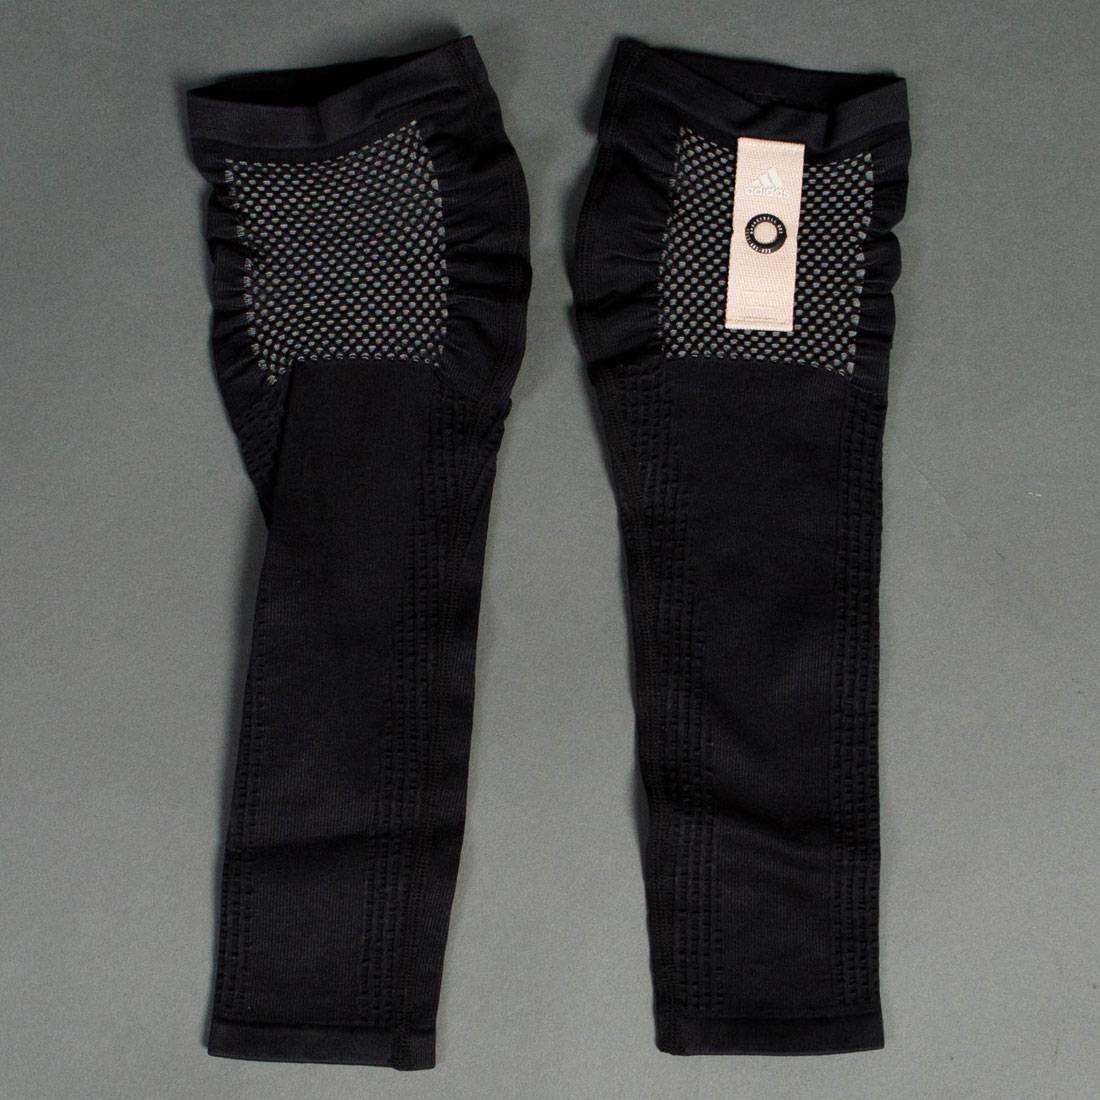 Adidas Consortium Day One Men Legwarmer (black) 1S